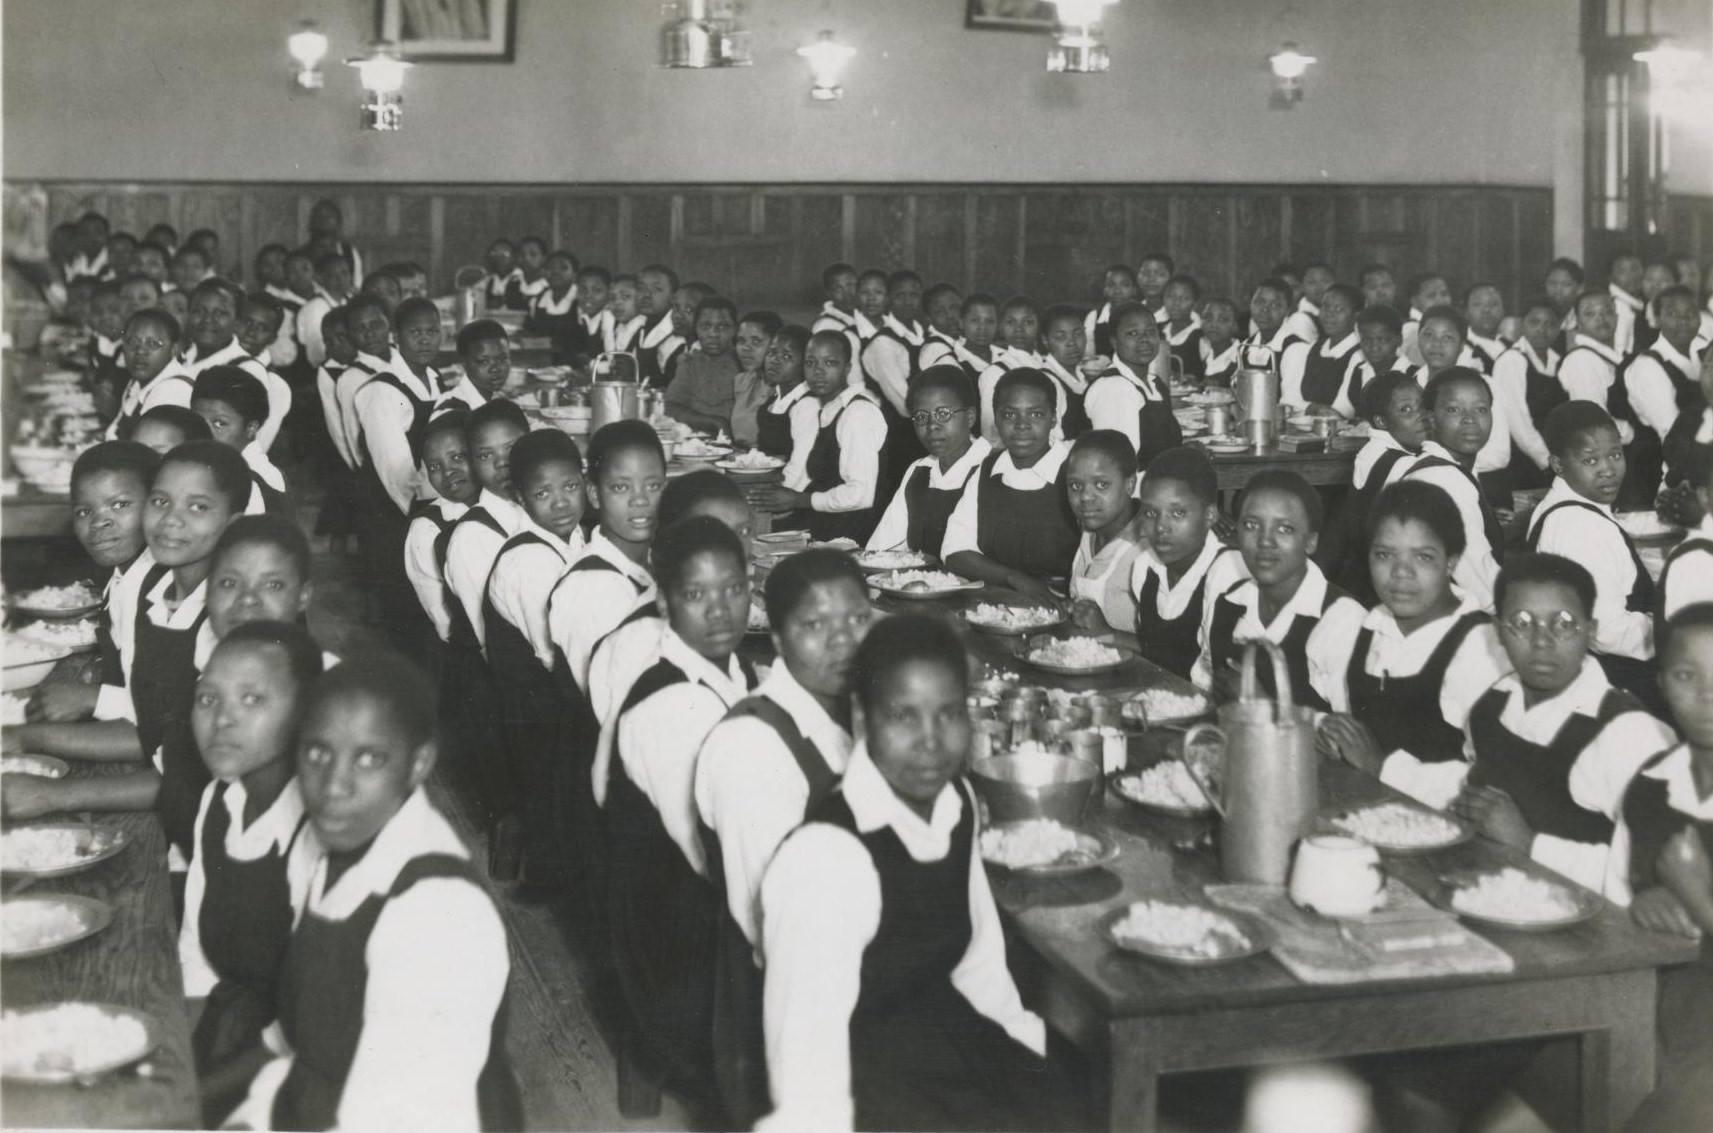 Bantu Education Protest